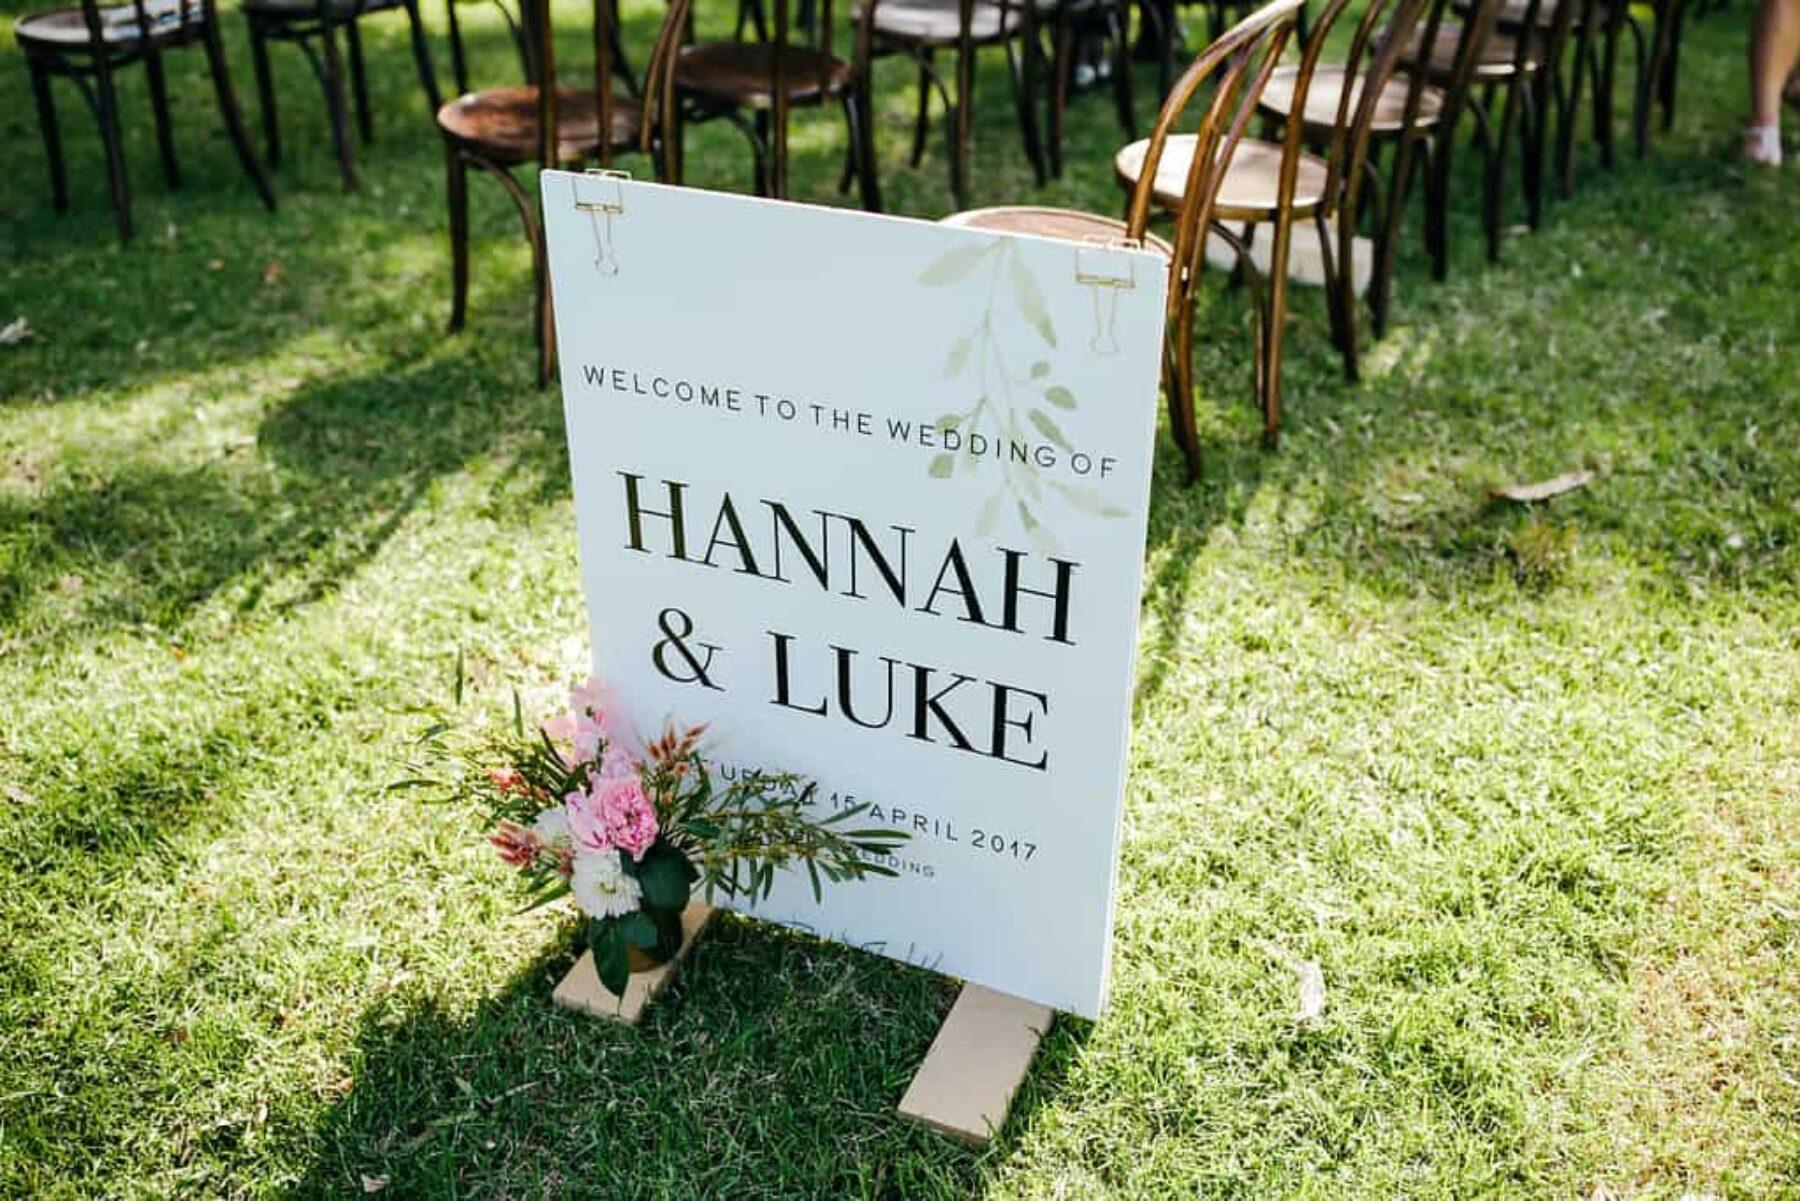 Sydney Centennial Park wedding by Lara Hotz photography